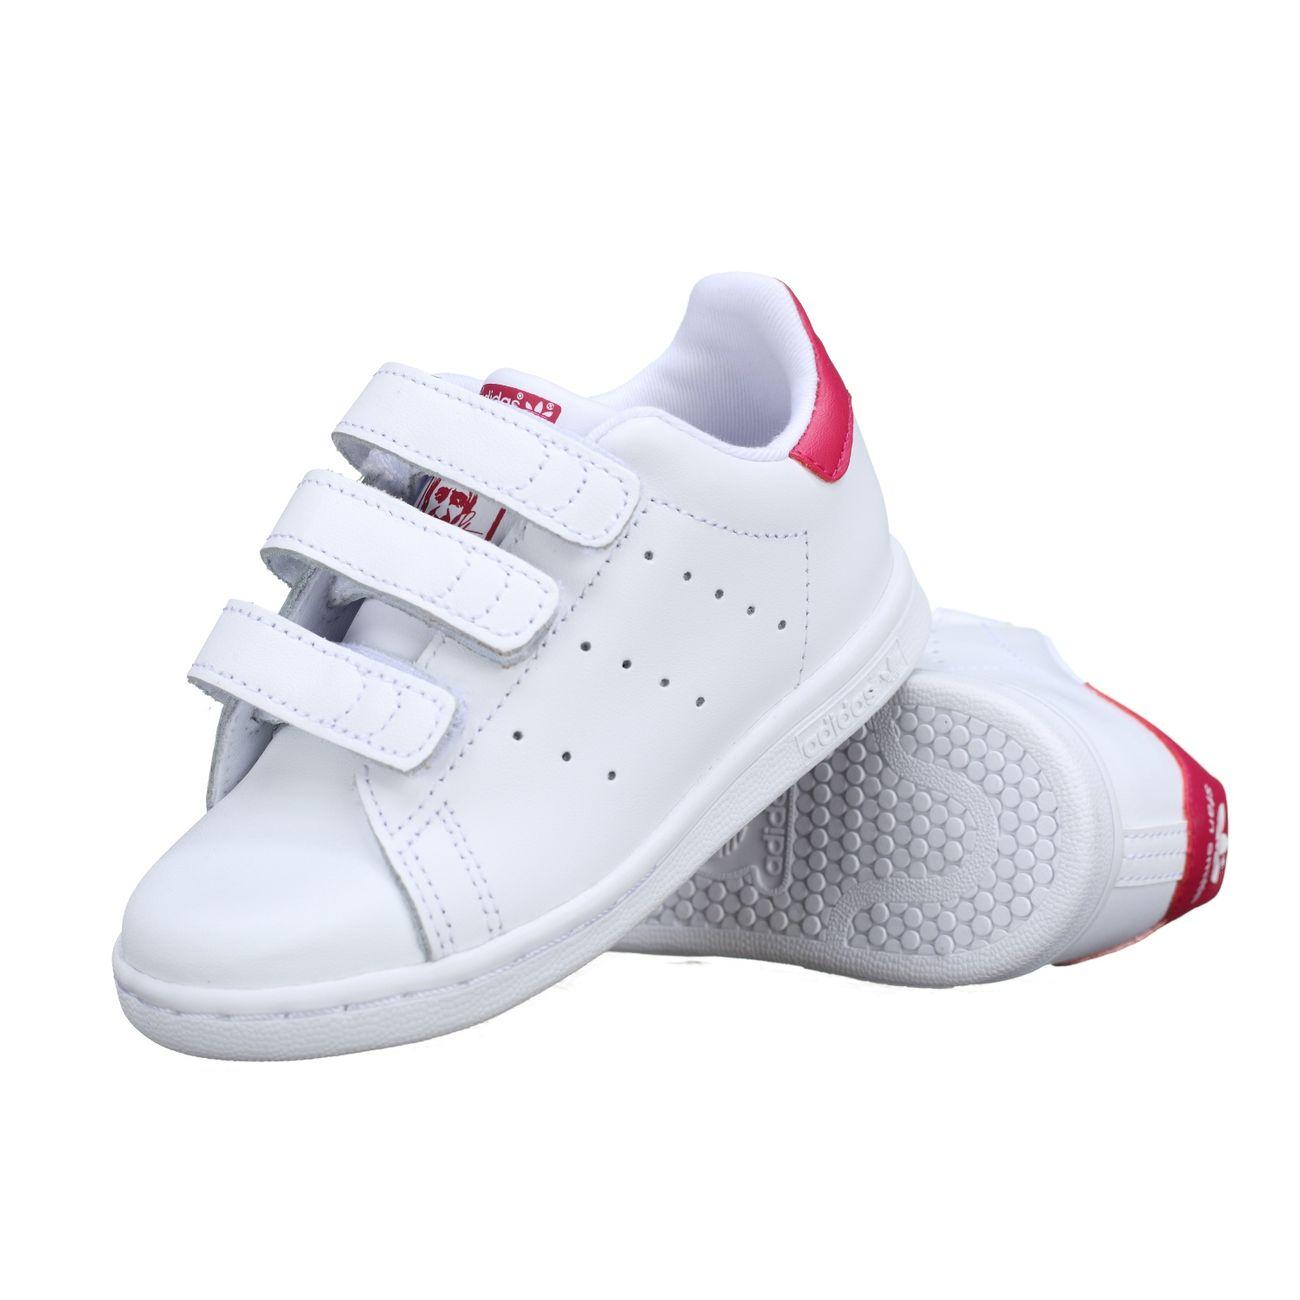 Mode- Lifestyle garçon ADIDAS Basket enfant Adidas Stan Smith Cf I Bz0523 Blanc / Rose